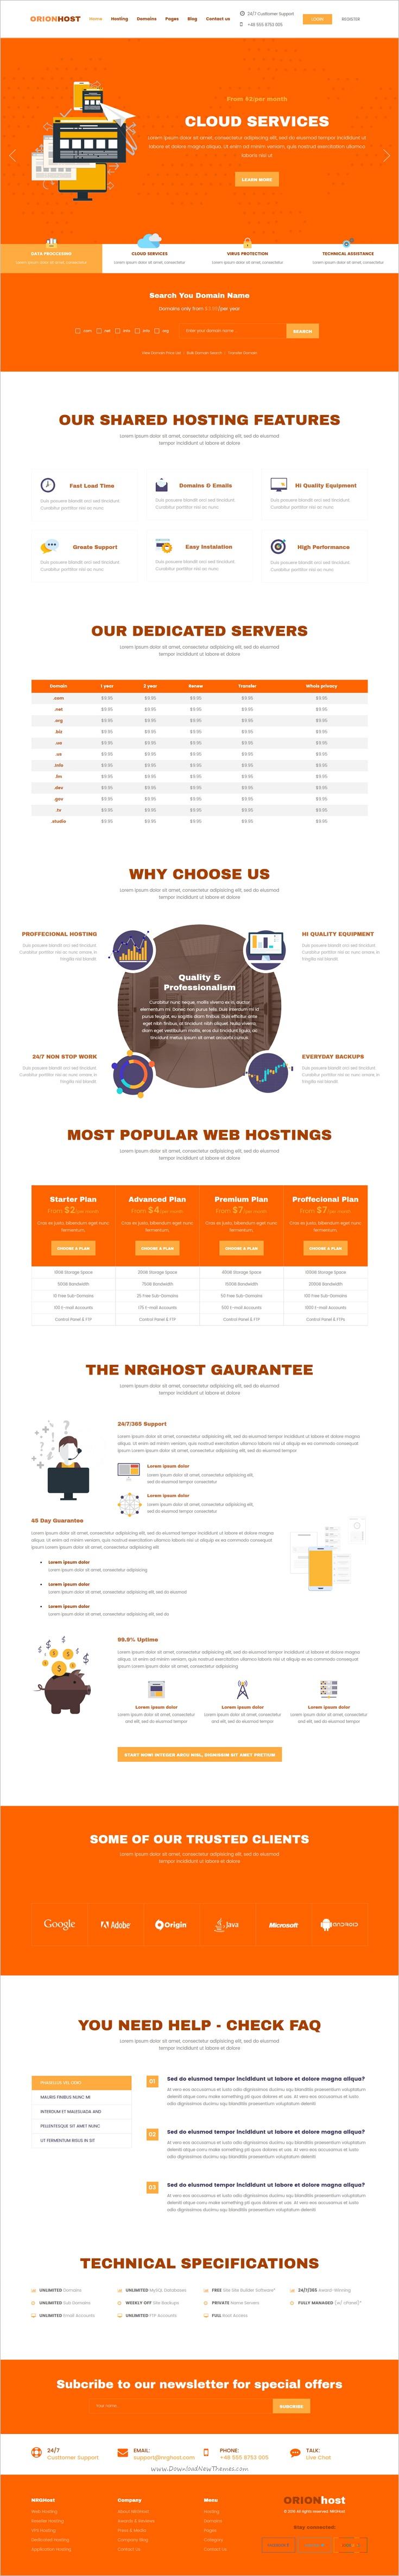 OrionHost Web Hosting Domain Technology Responsive HTML Template